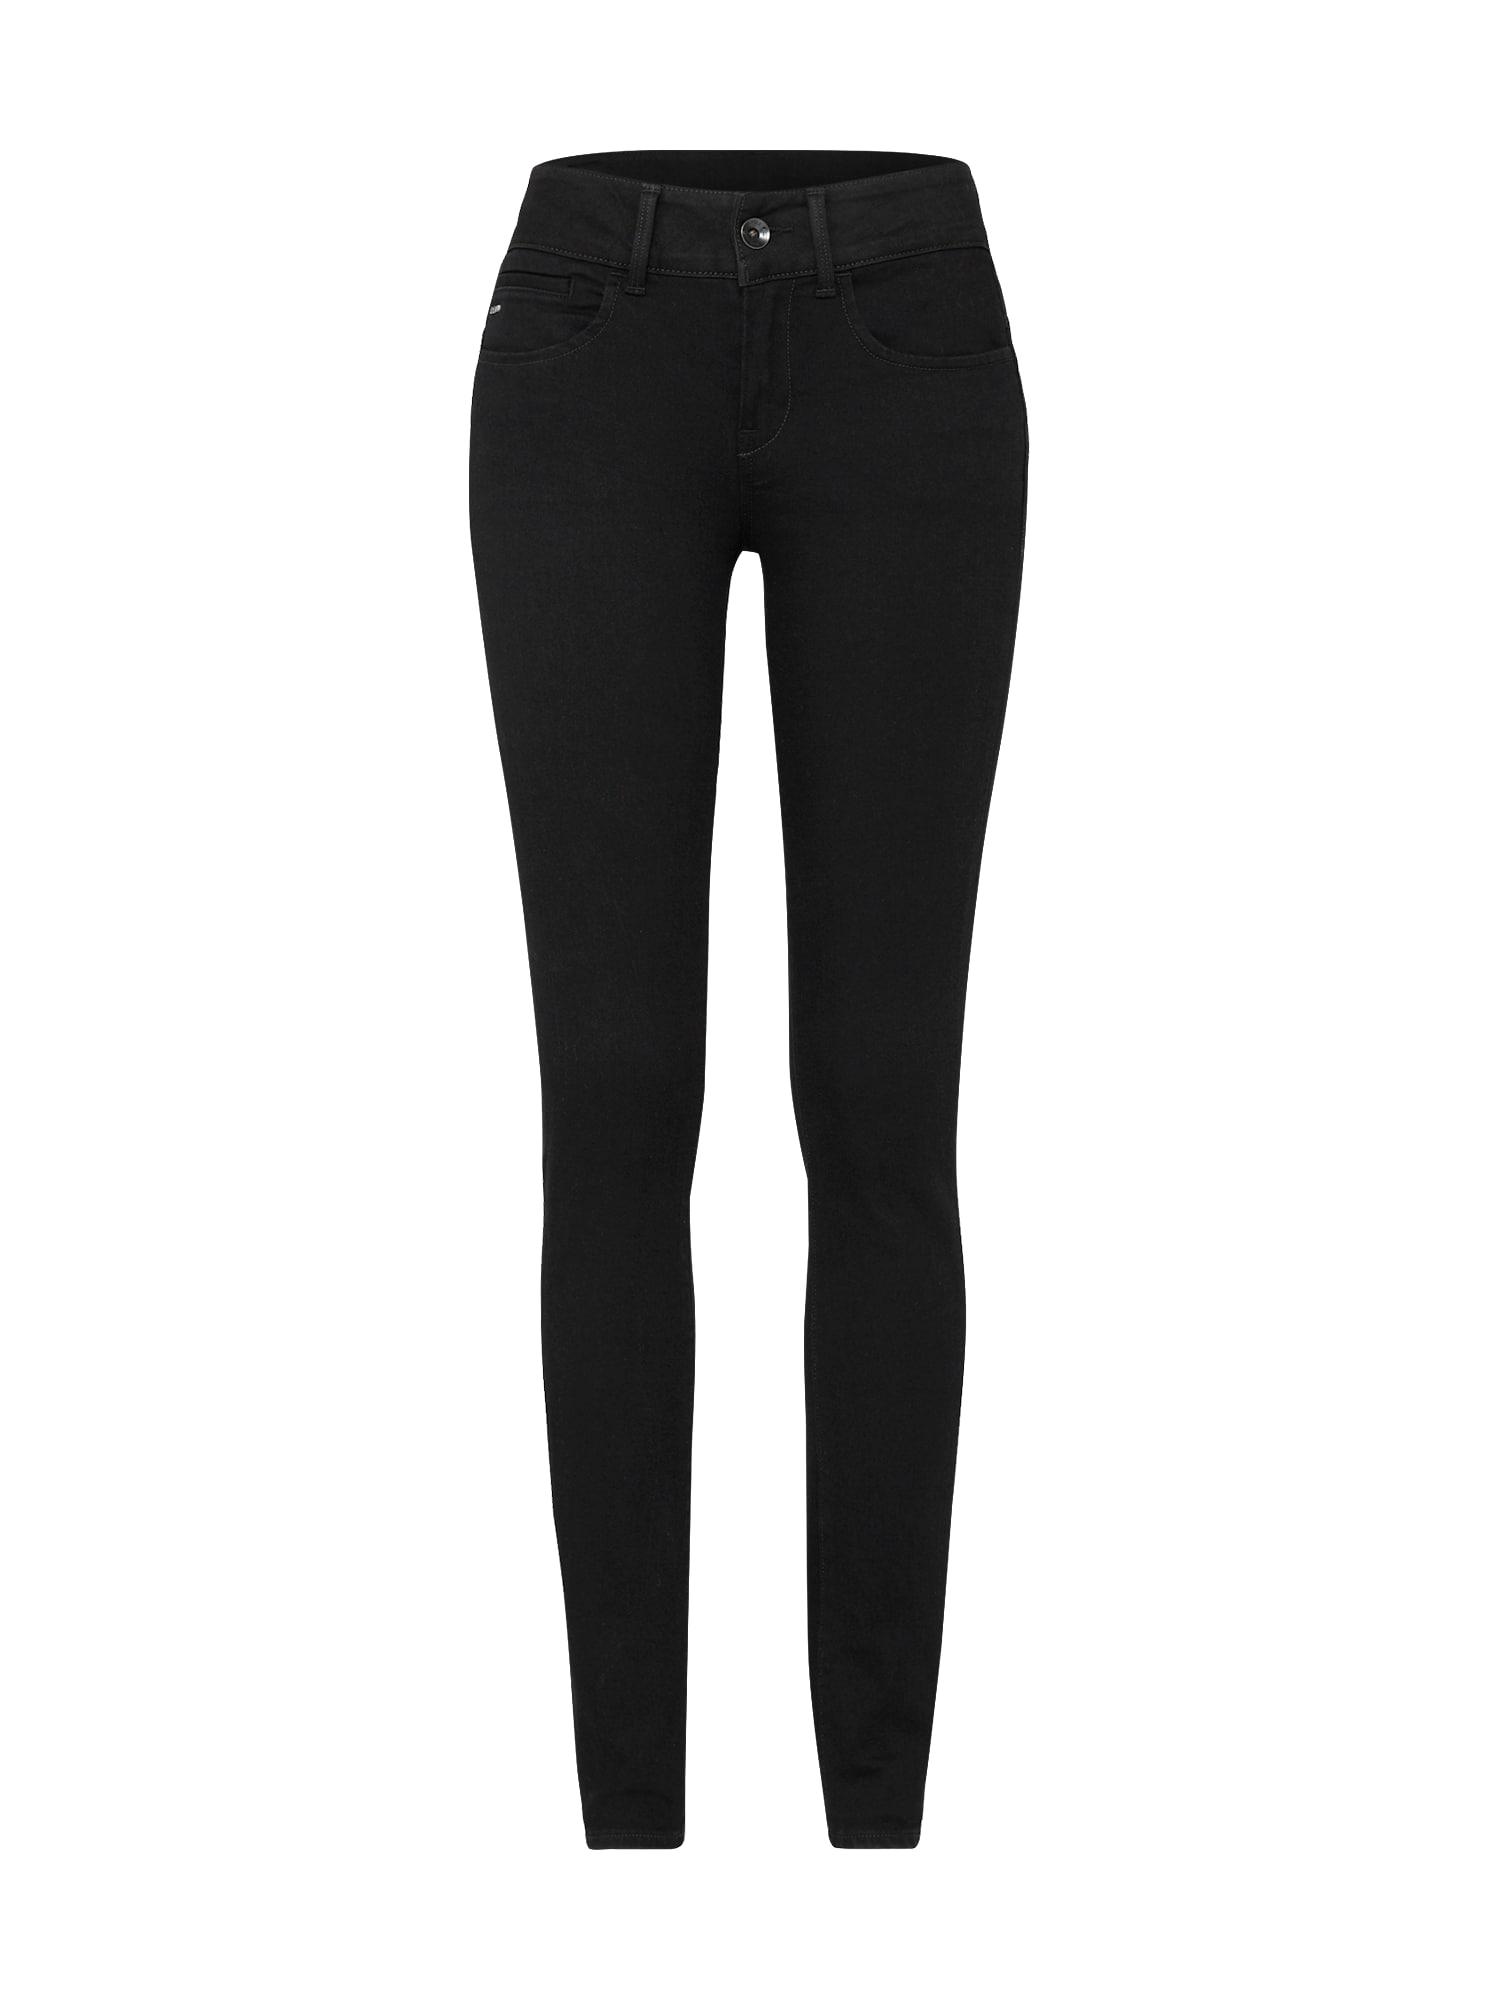 G-STAR RAW Dames Jeans Midge d-Cody zwart